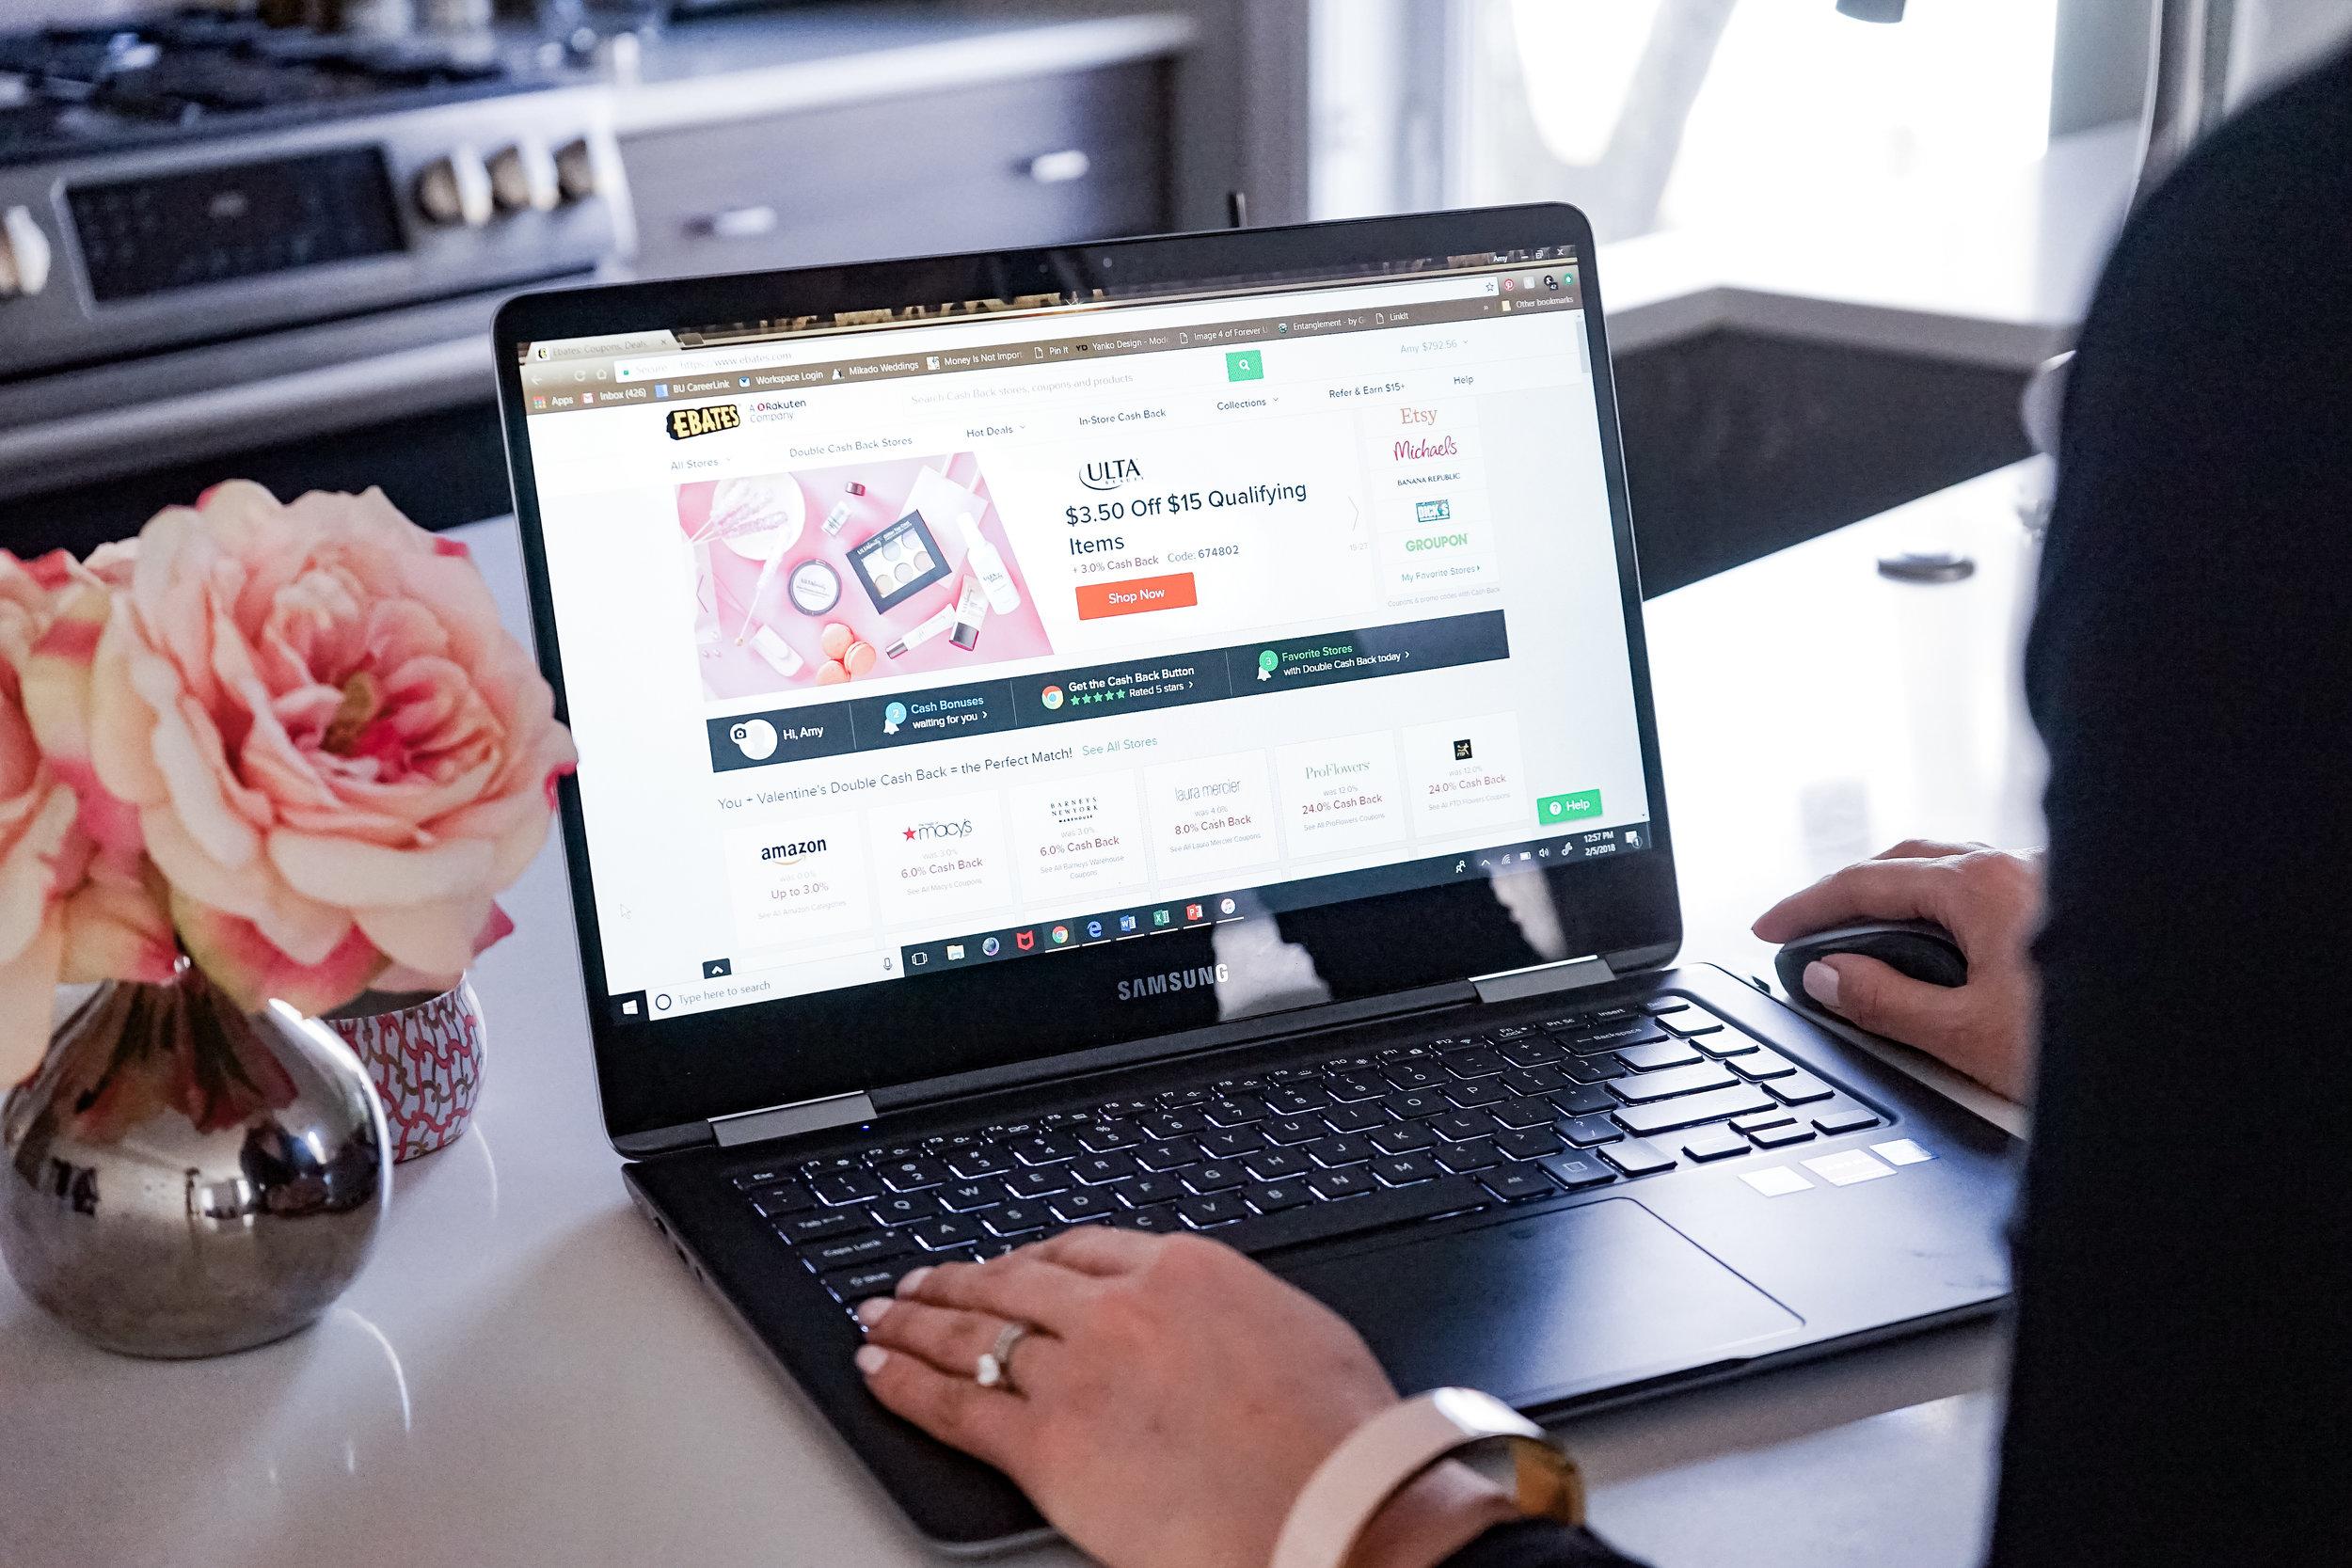 Save Money While Shopping with Ebates - TheNinesBlog.com : A Boston Blog